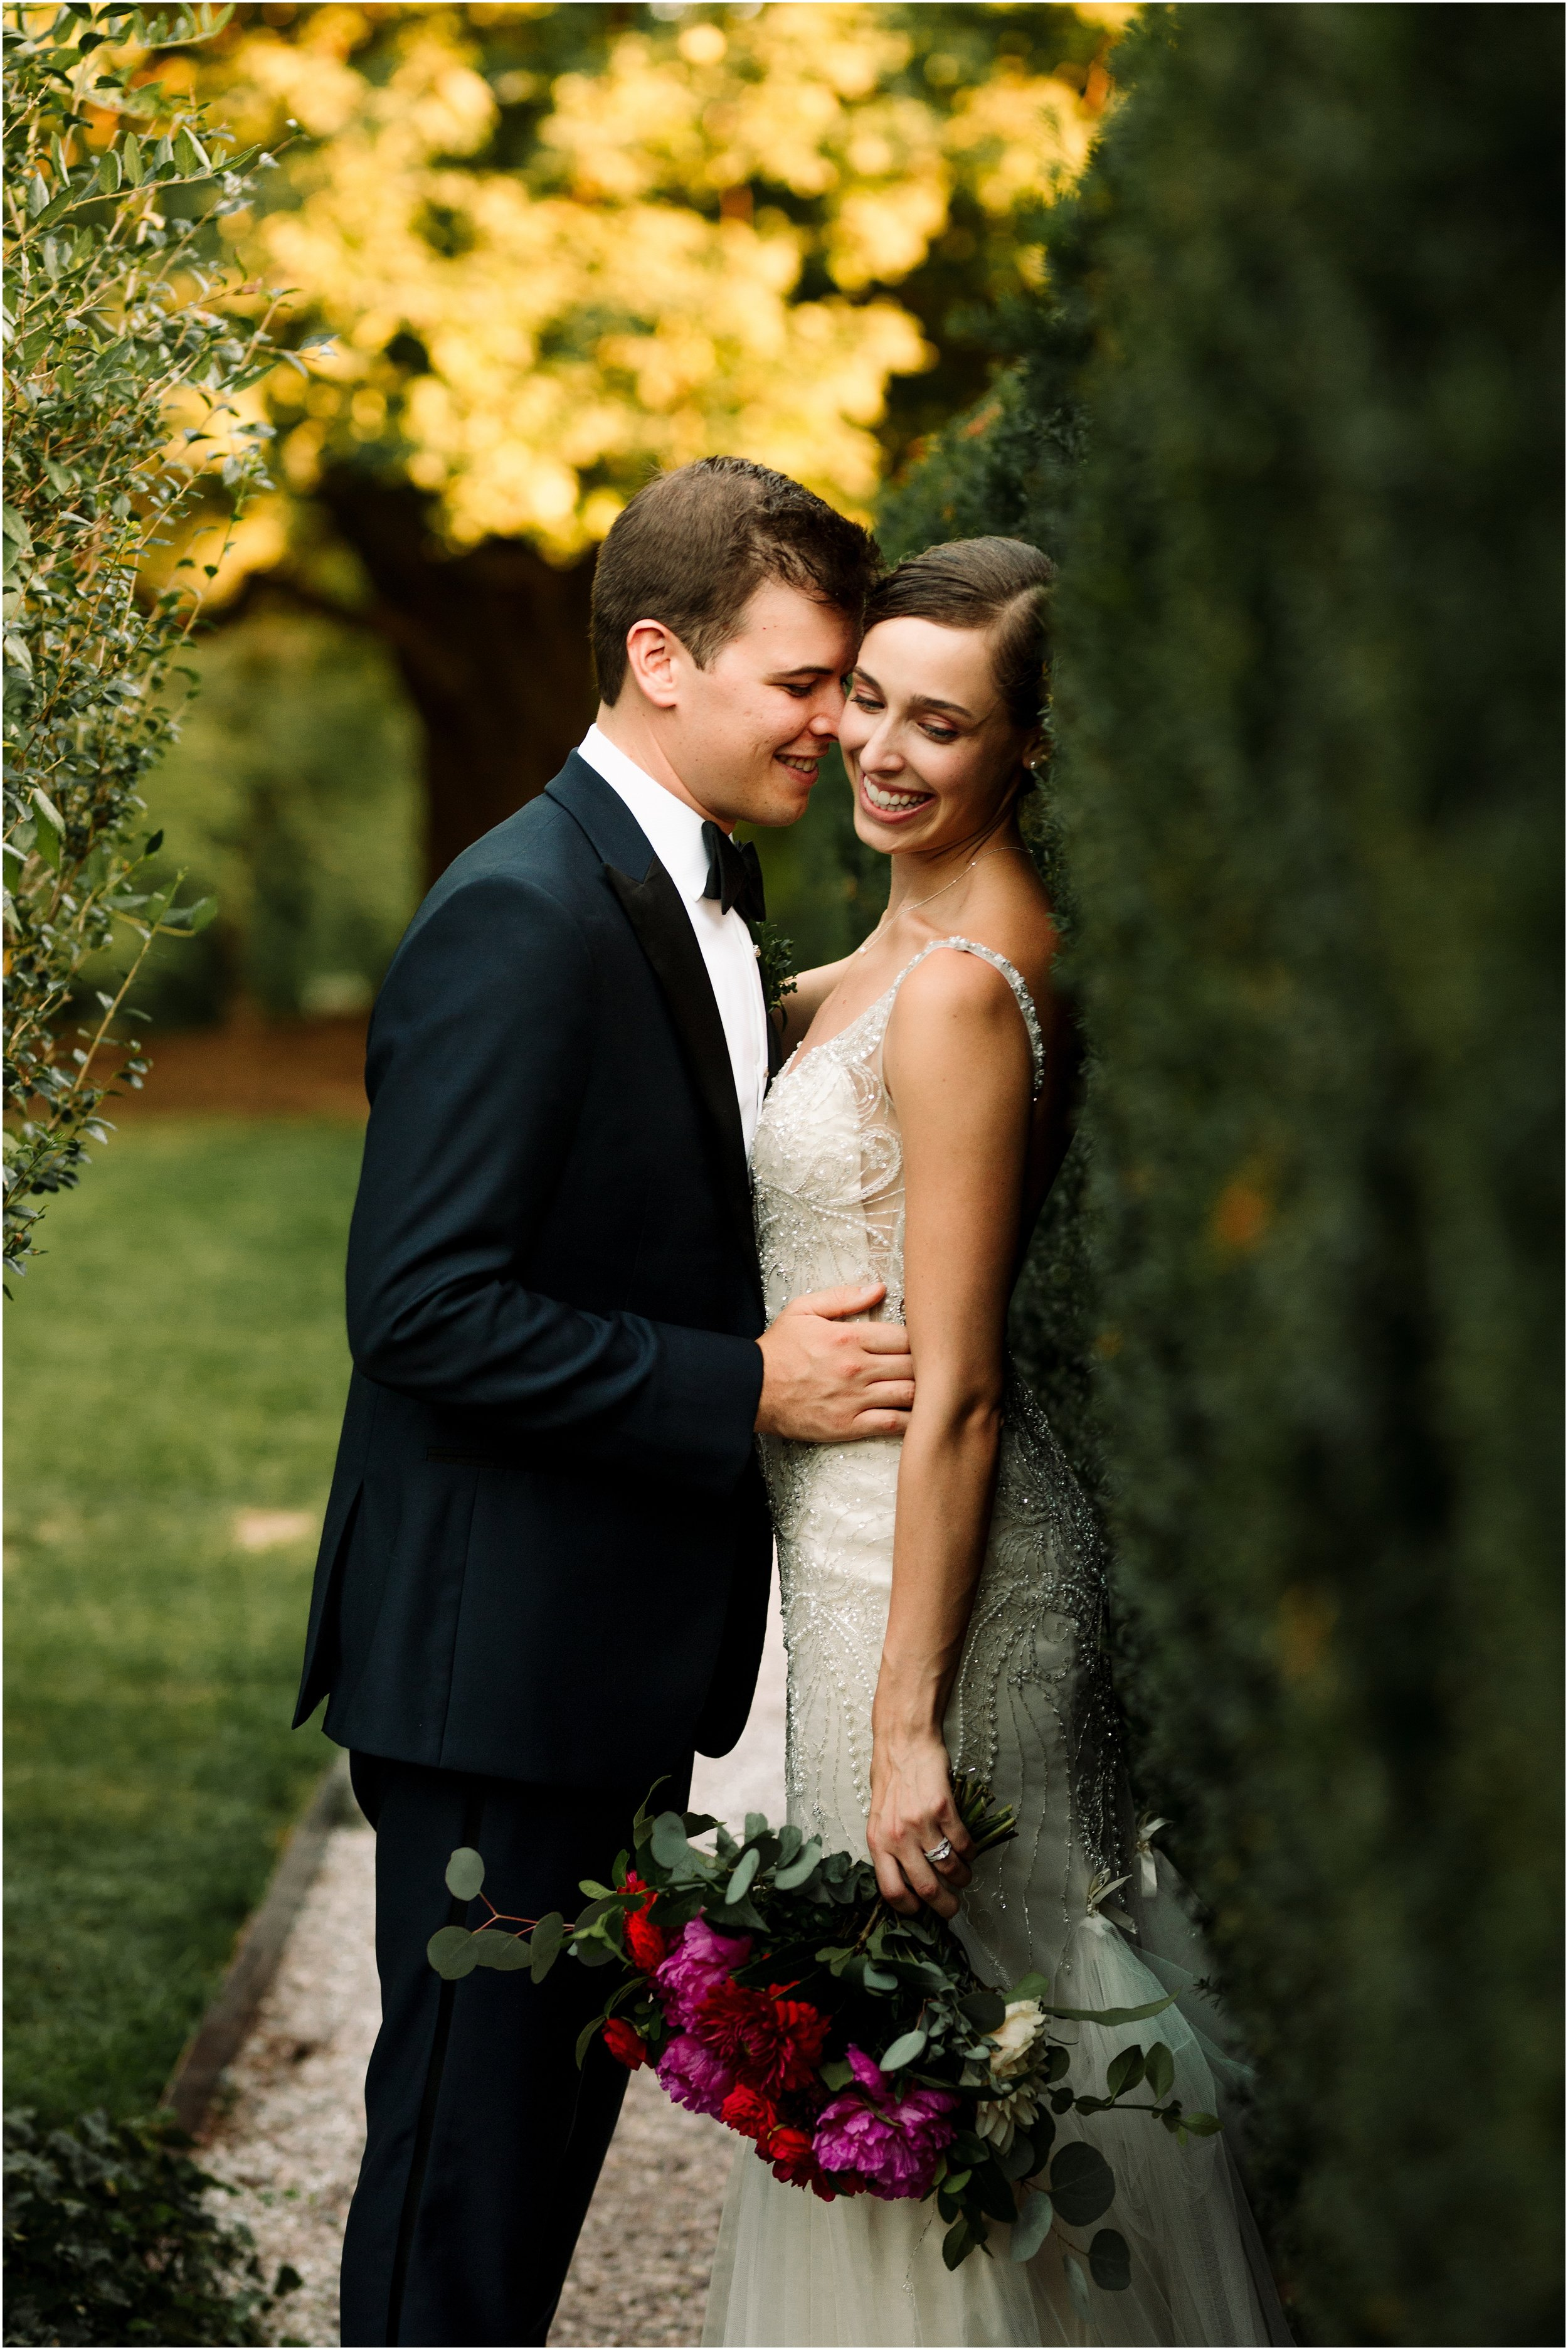 hannah leigh photography Antrim 1844 Wedding_1269.jpg